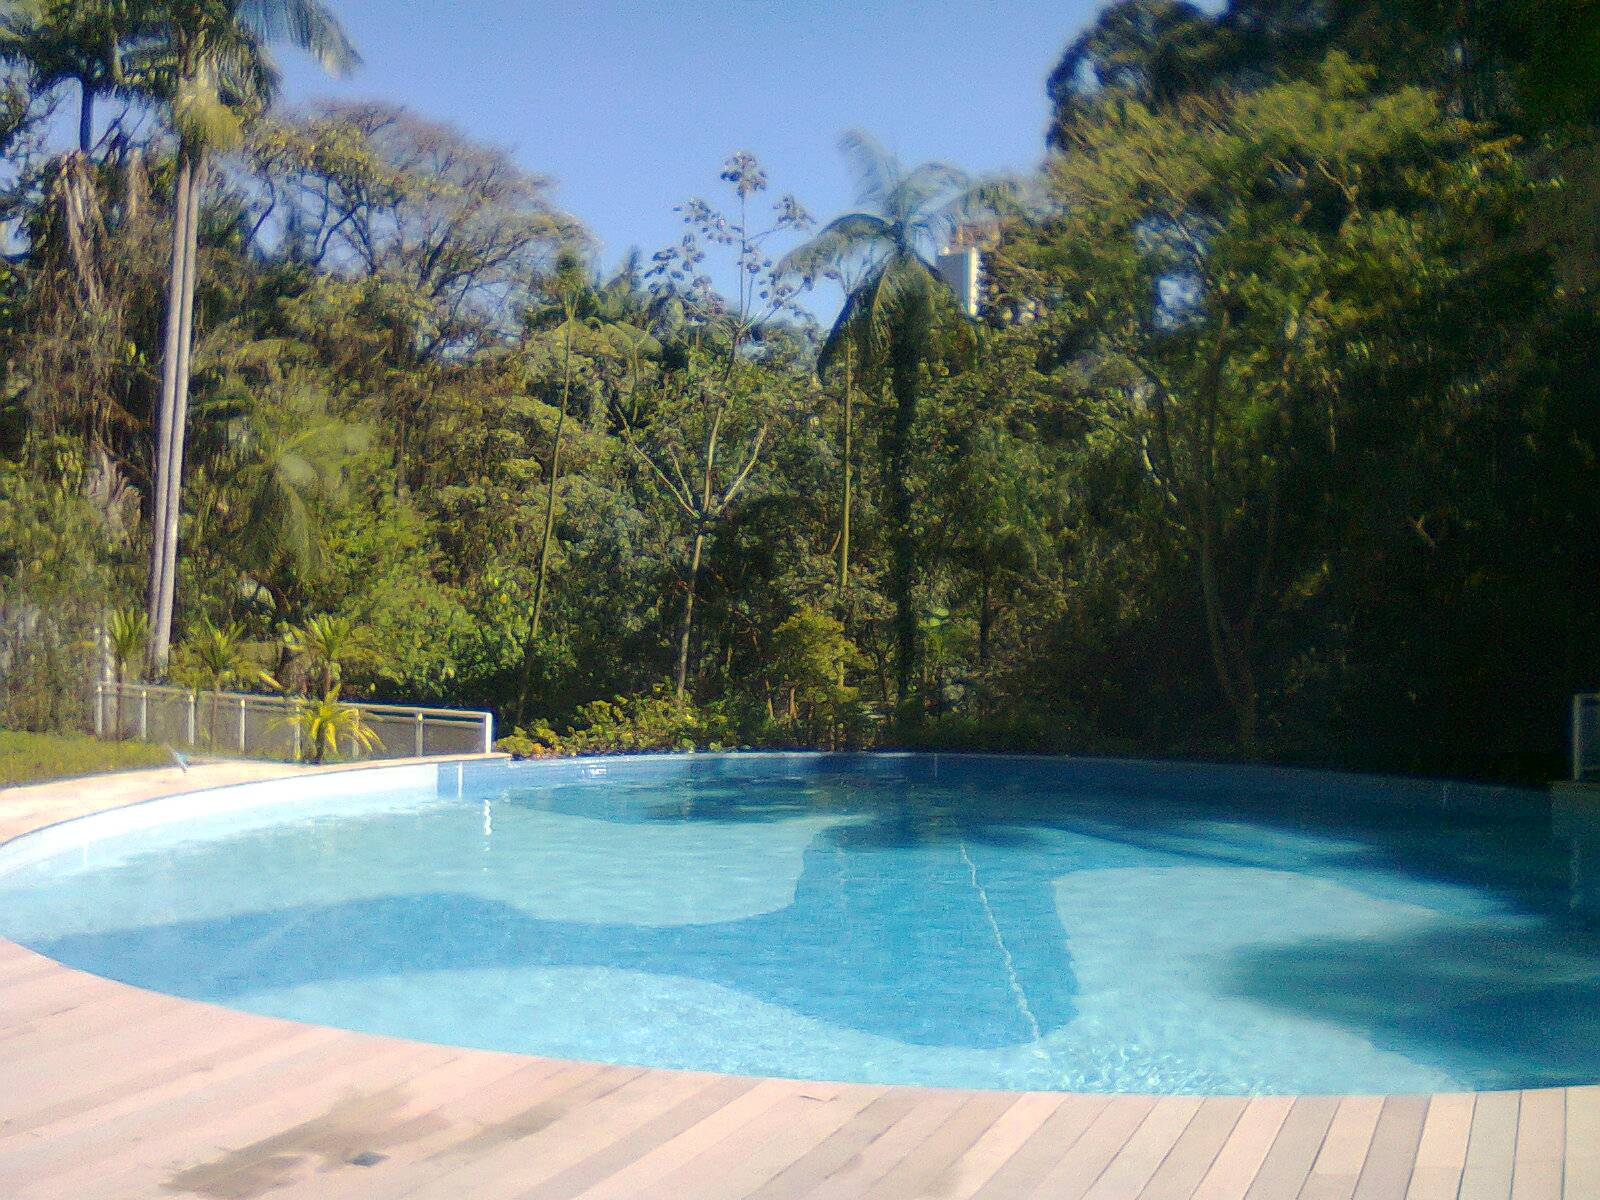 Contratar Tratamento de Piscina no Jardim Marajoara - Limpeza Urgente de Piscina